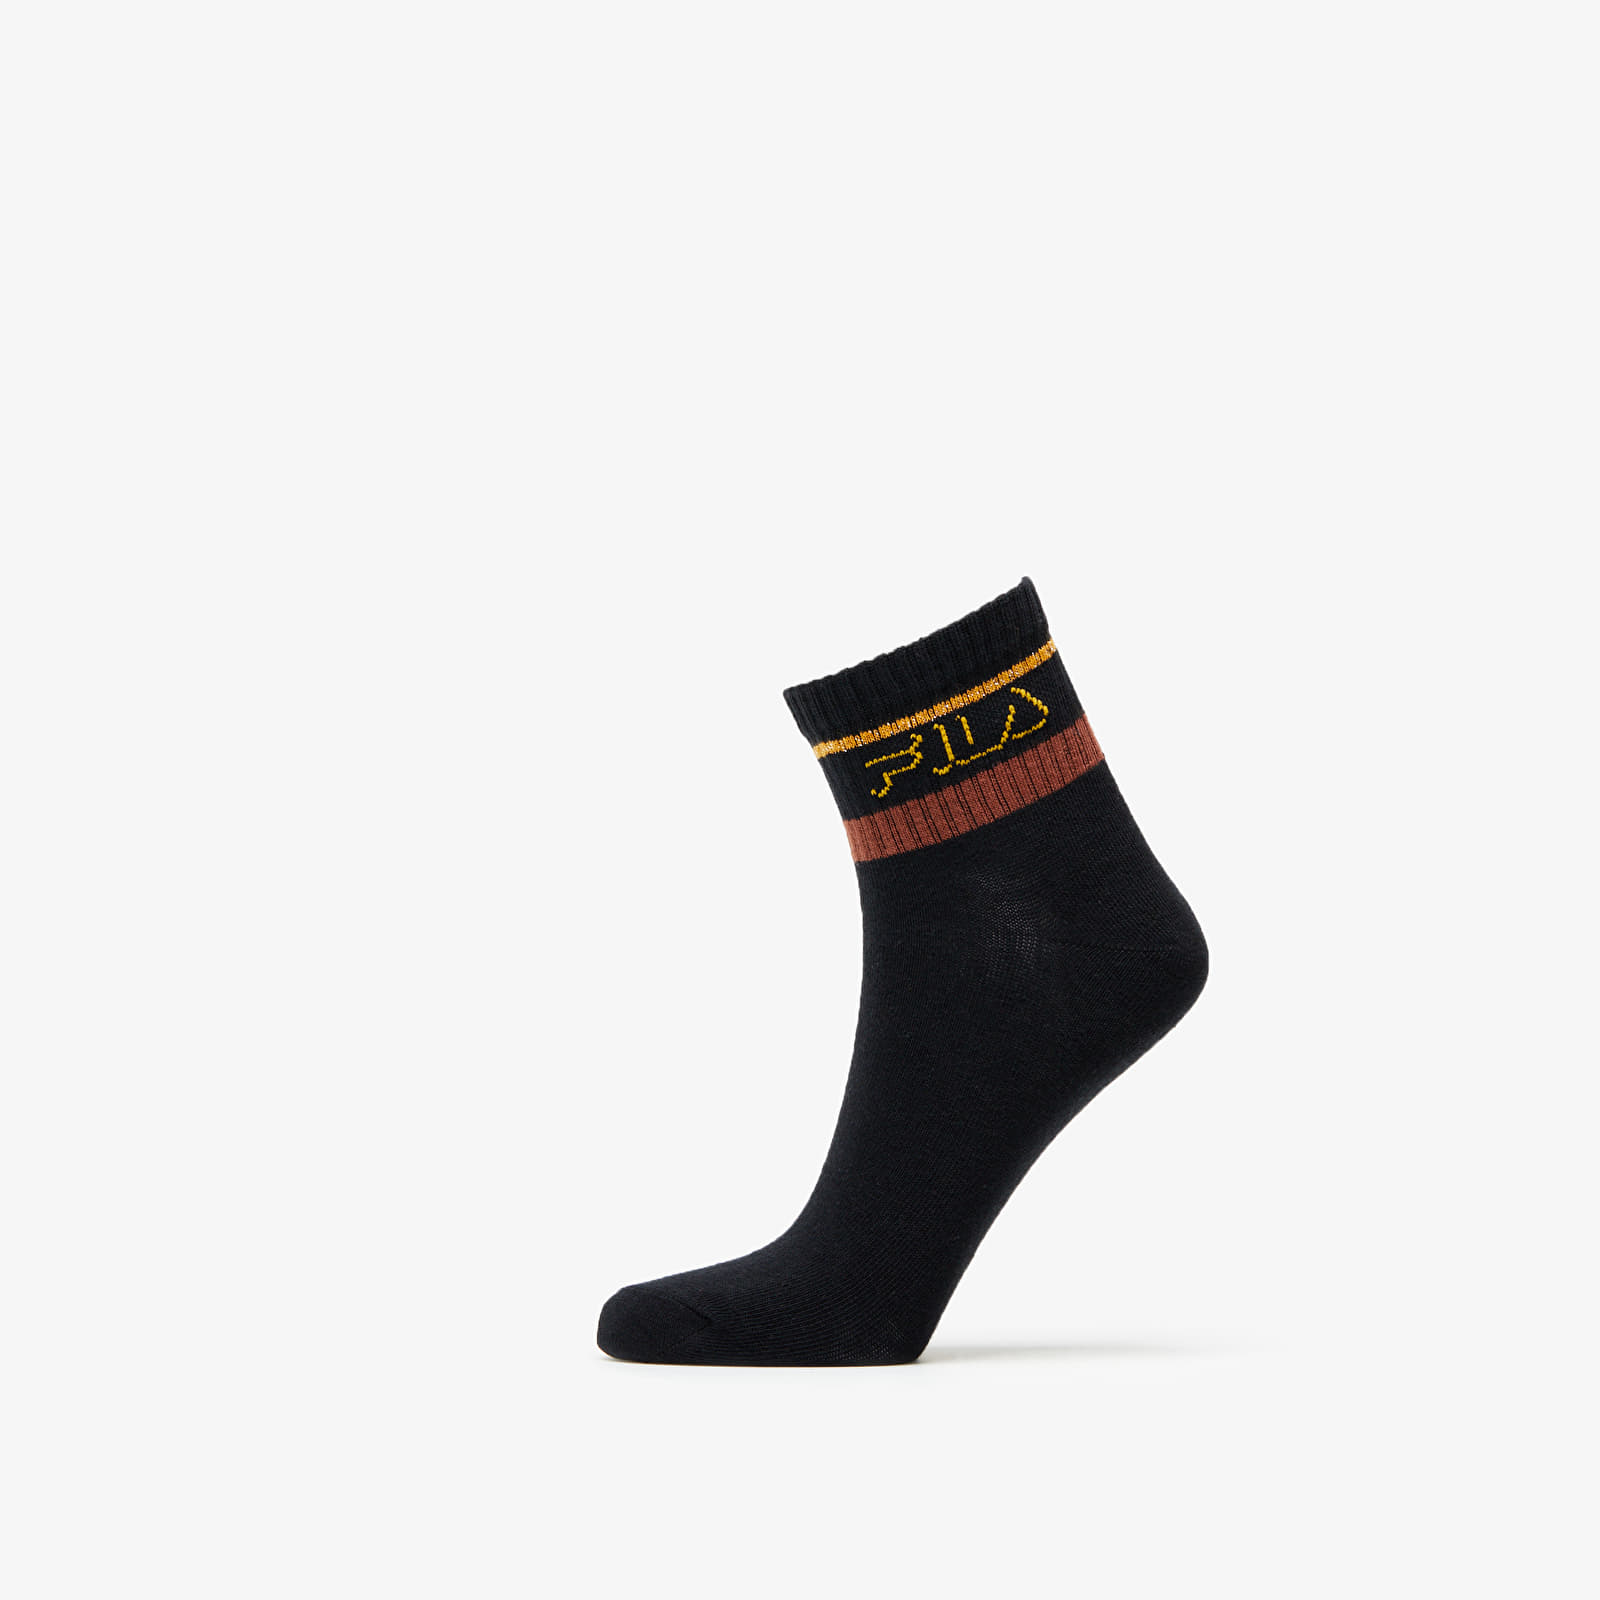 Chaussettes FILA 3 Pack Socks Fashion Assorted